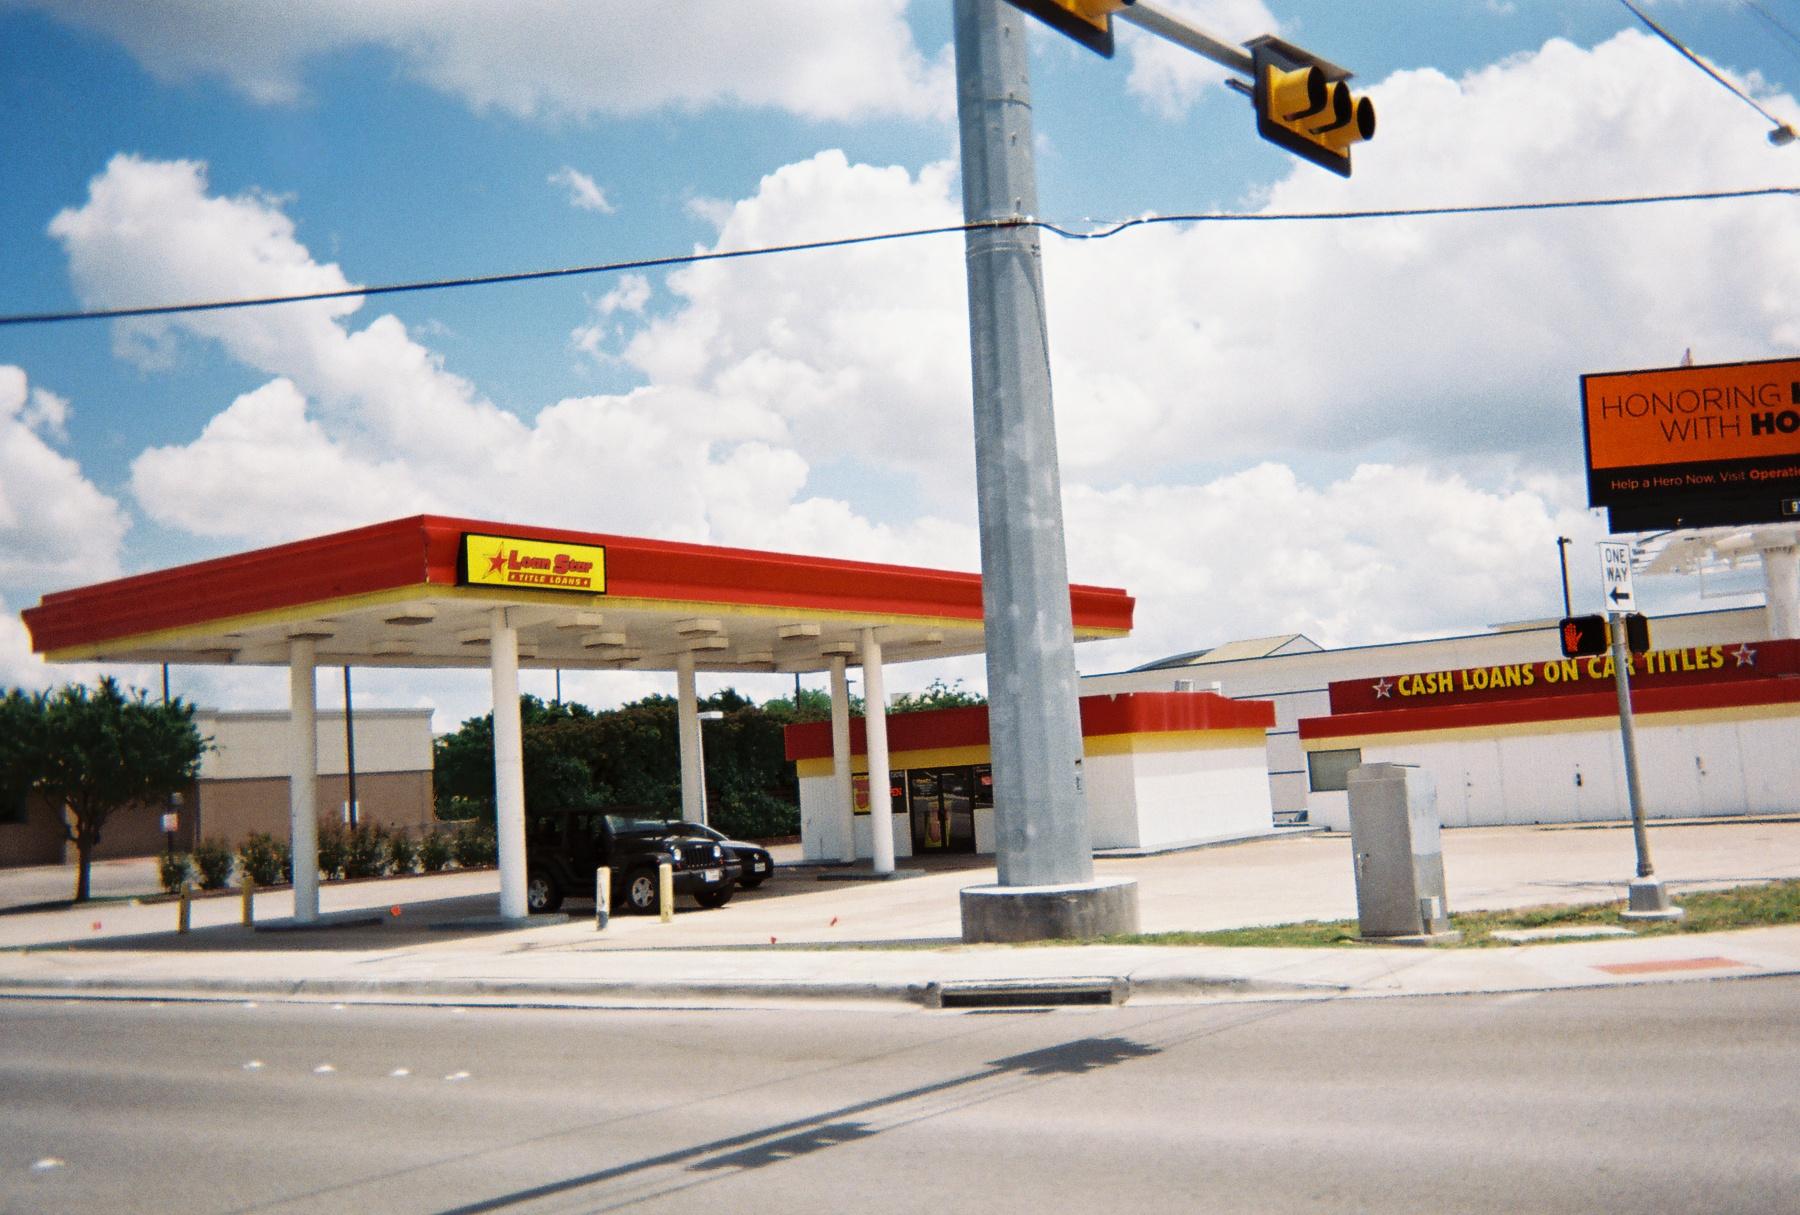 LoanStar Title Loans - Bryan, Texas Facebook